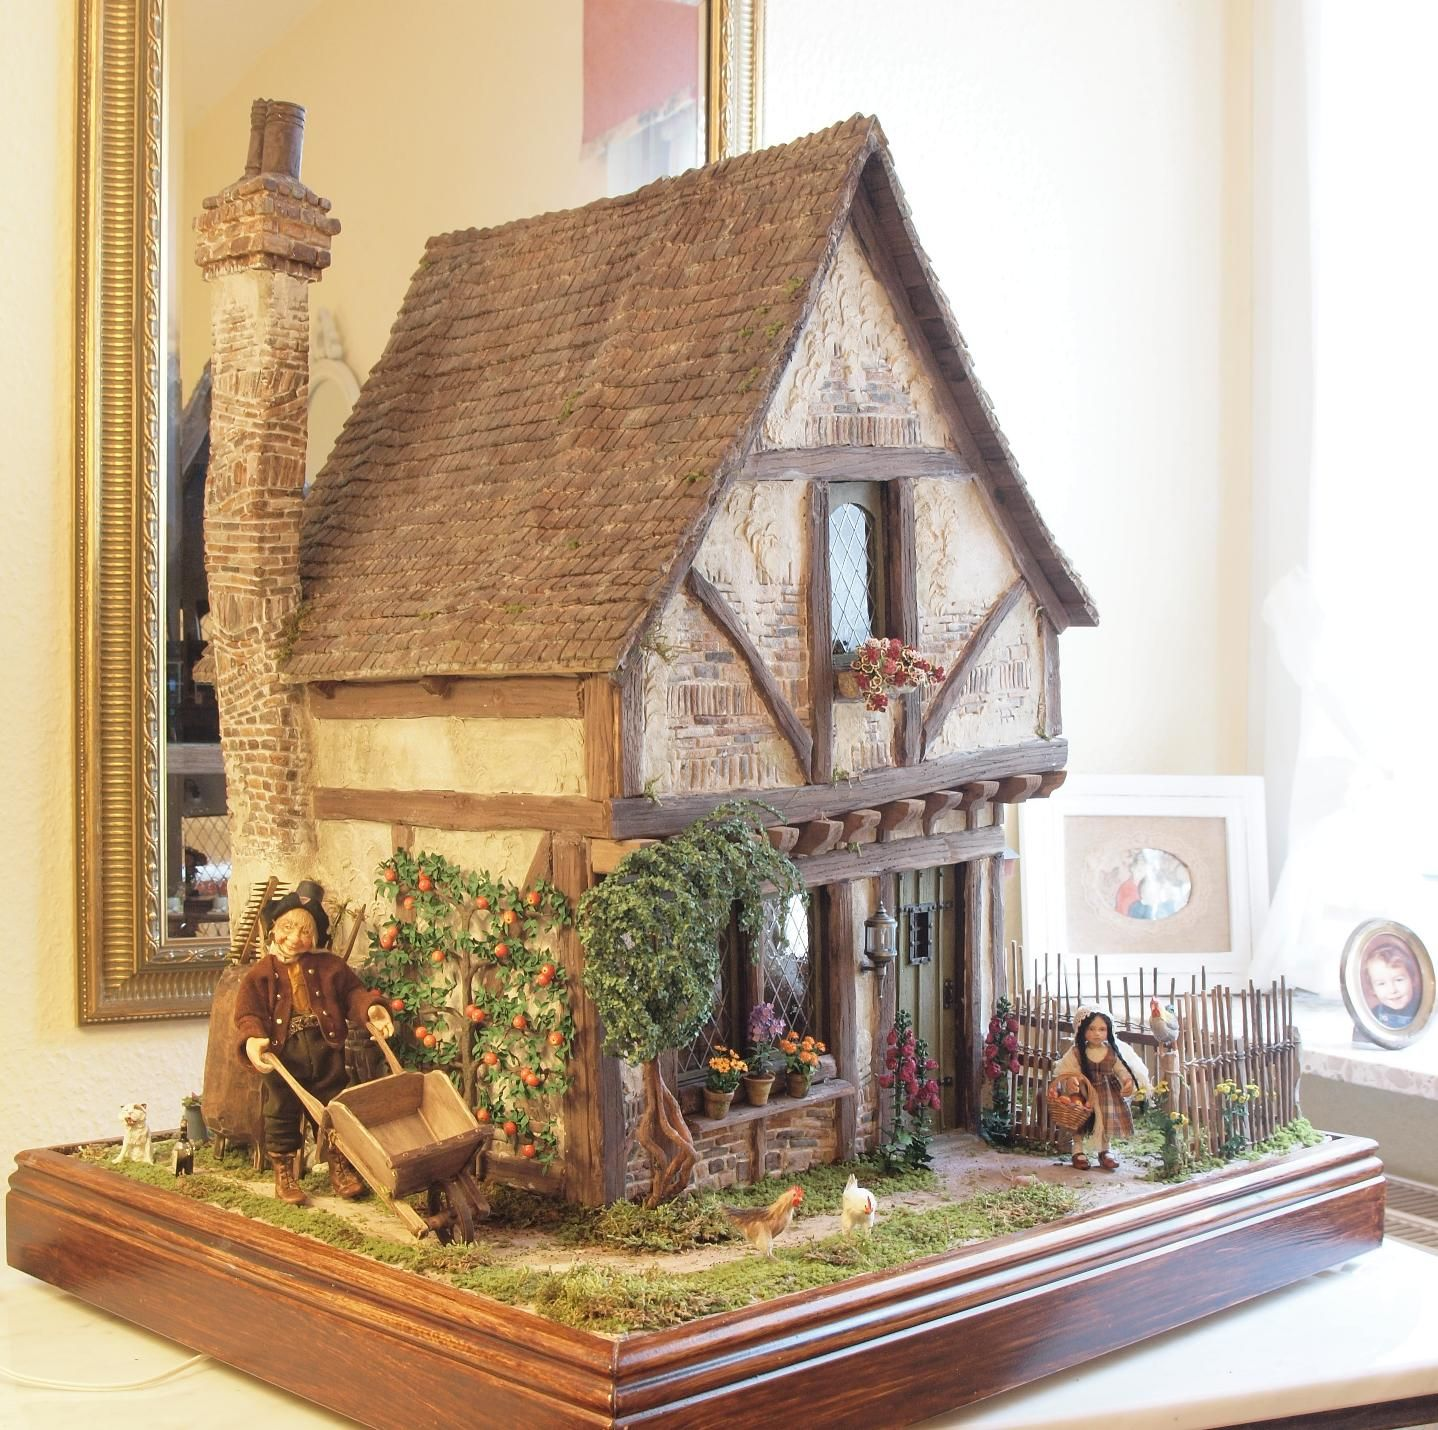 karin caspar modellh user pinterest puppenstube miniatur und puppentheater. Black Bedroom Furniture Sets. Home Design Ideas